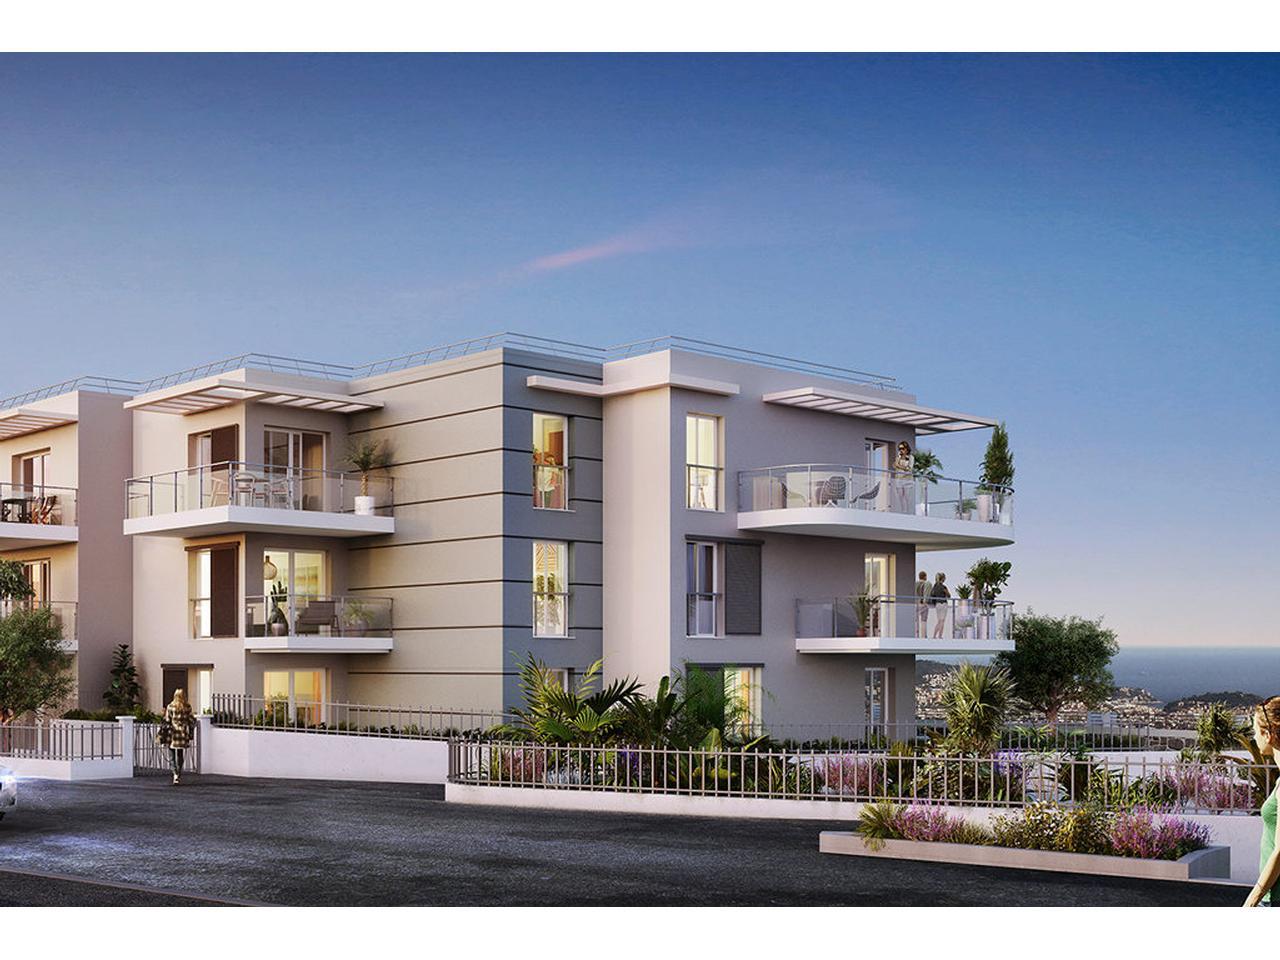 Immobilier nice vue mer appartement nice 3 pieces vefa a for Appartement rez de jardin nice